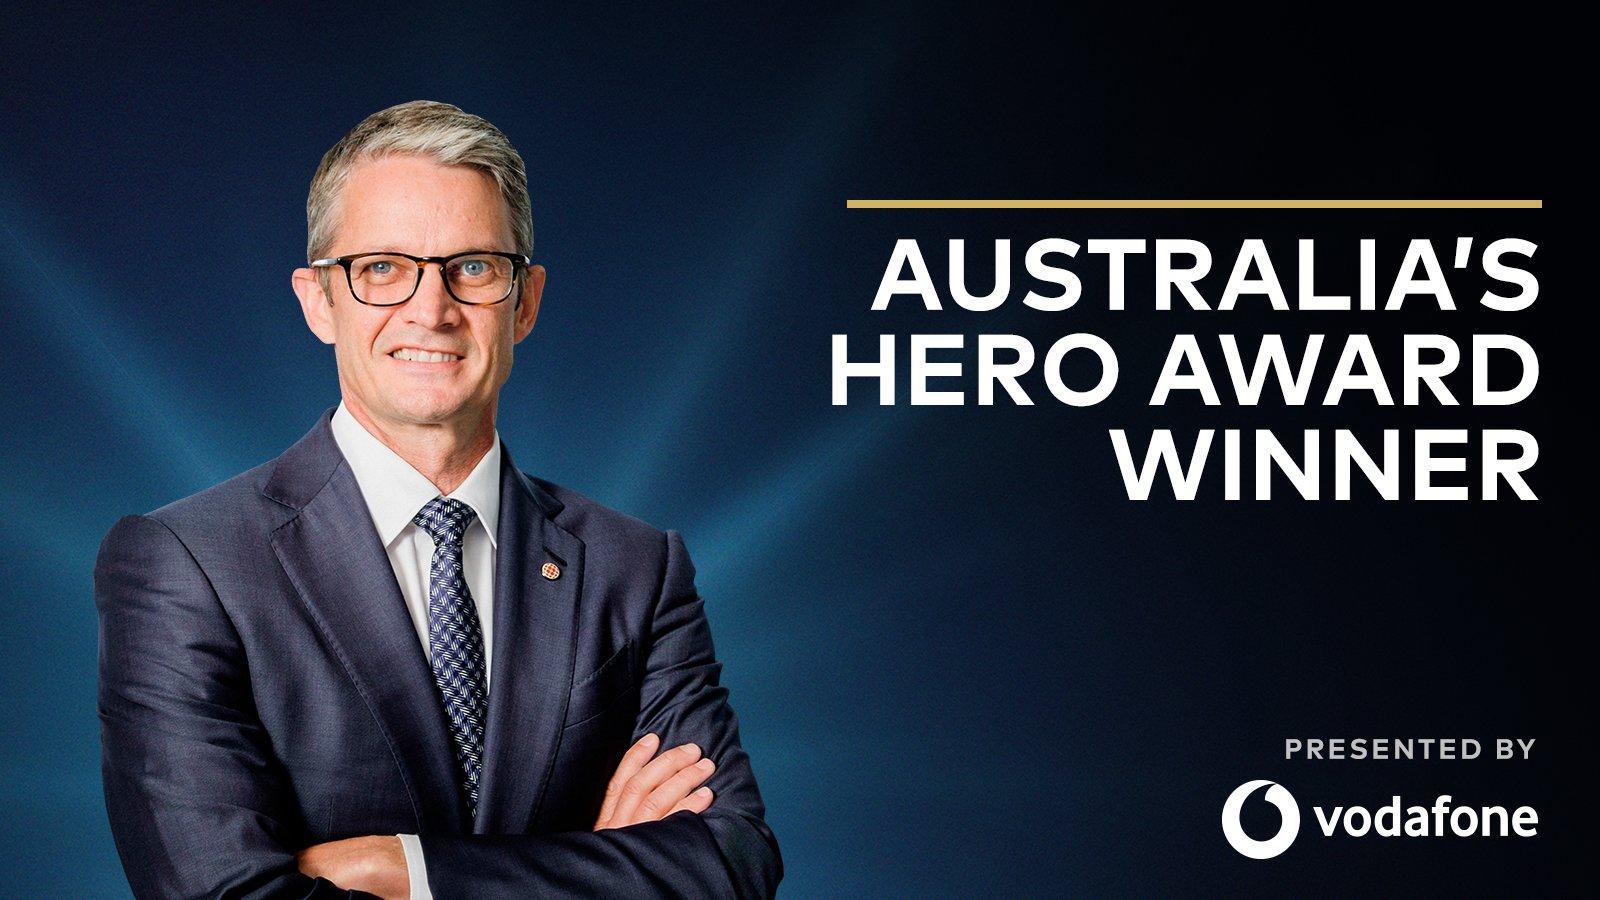 Australia's Hero Award